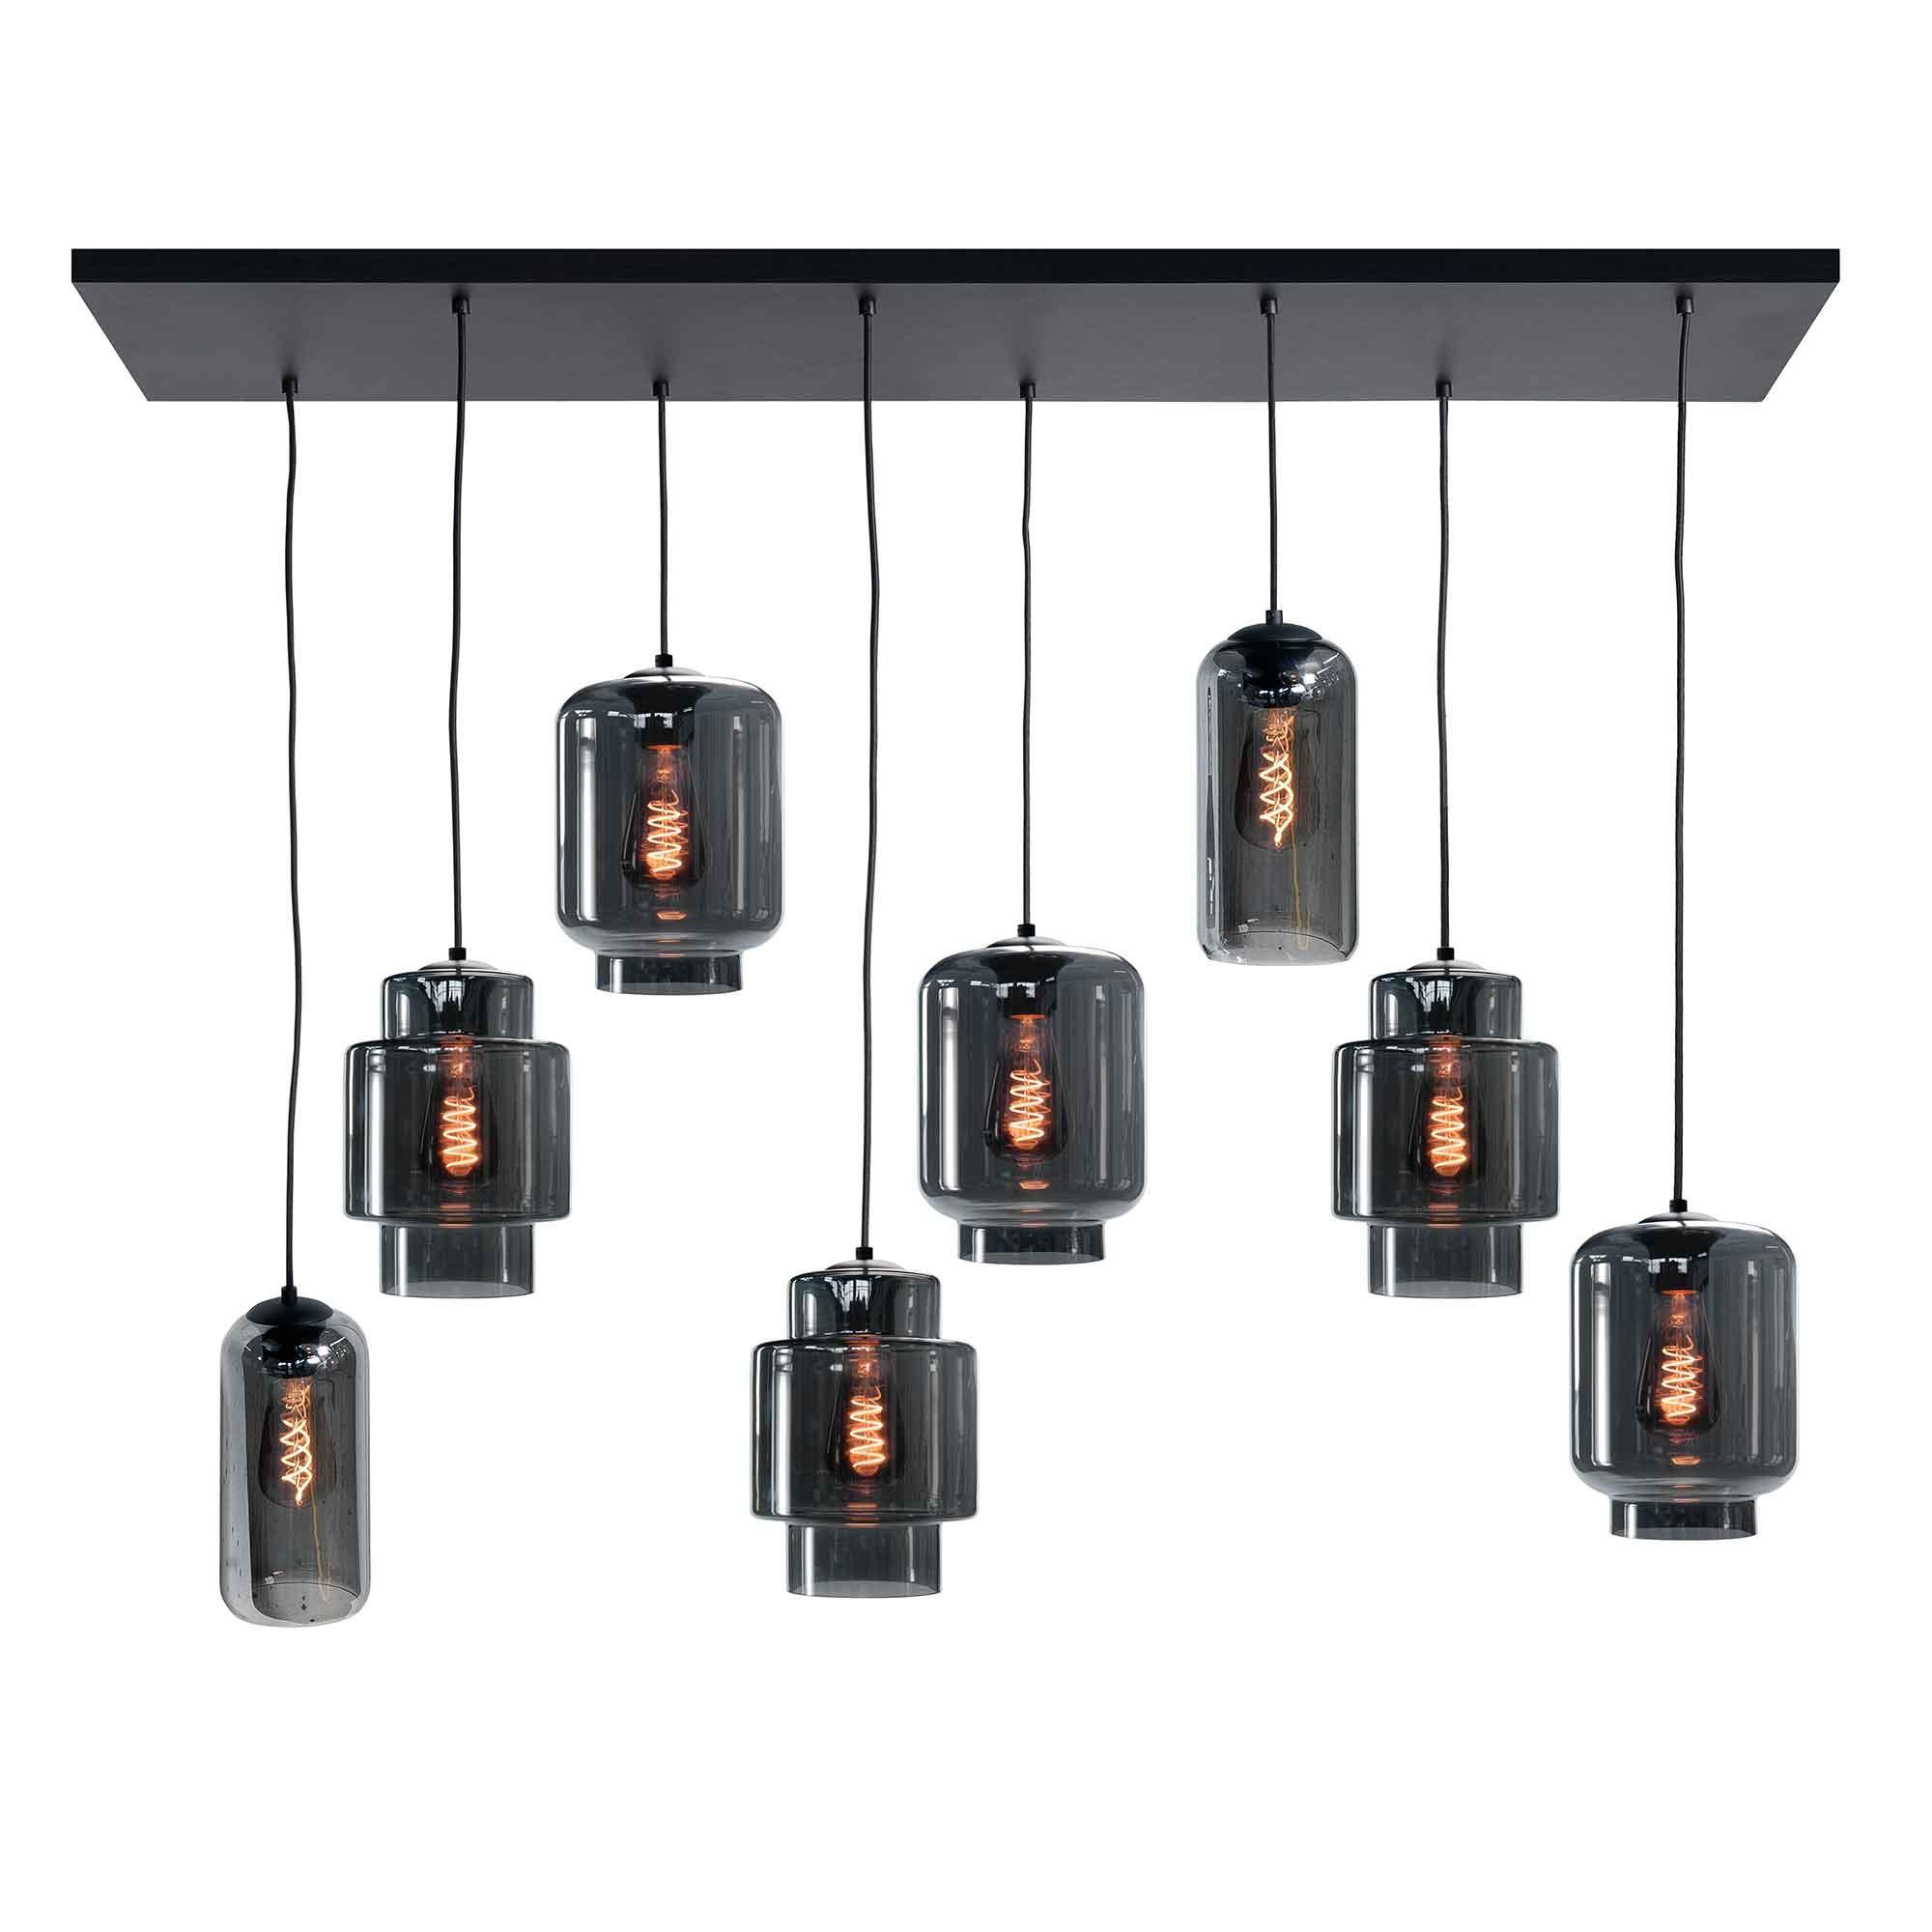 Highlight Hanglamp Fantasy Moderno 8 lichts L 130 x B 35 cm rook zwart